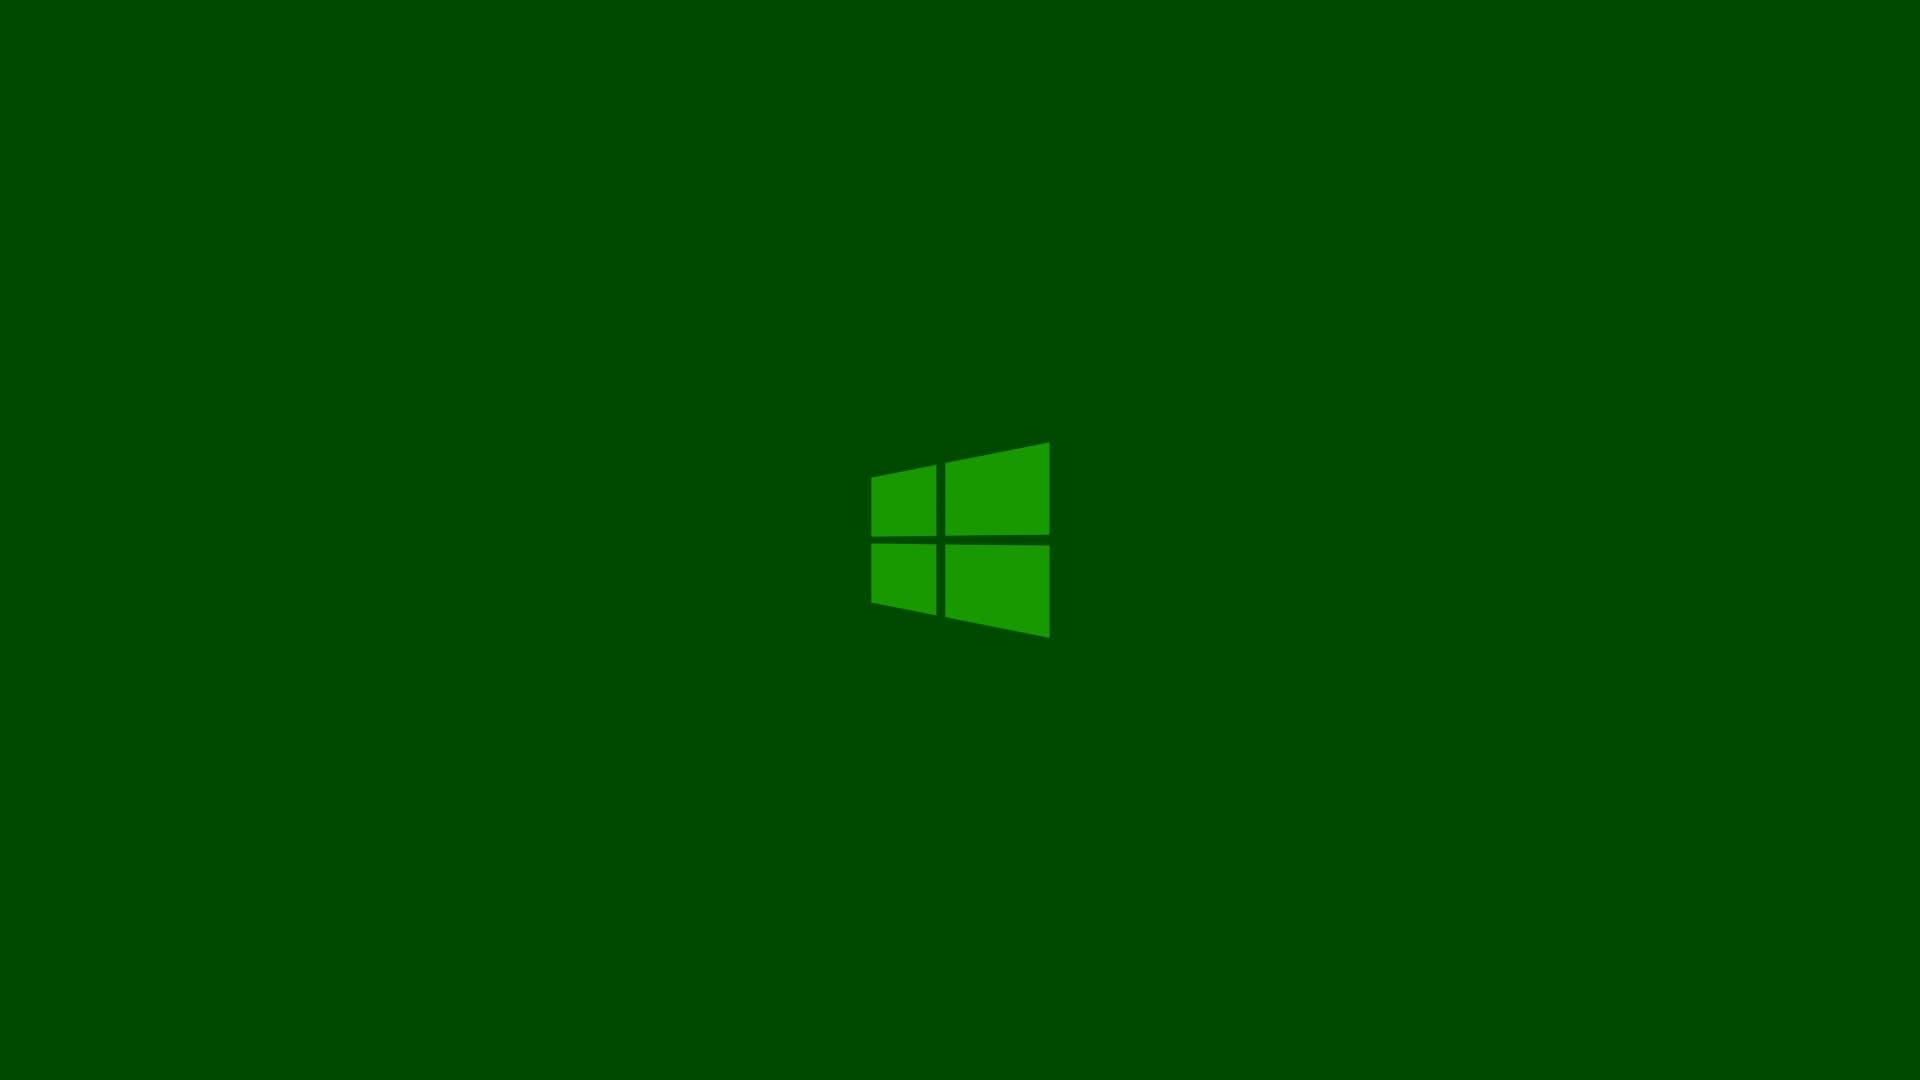 Wallpaper For Laptop Green